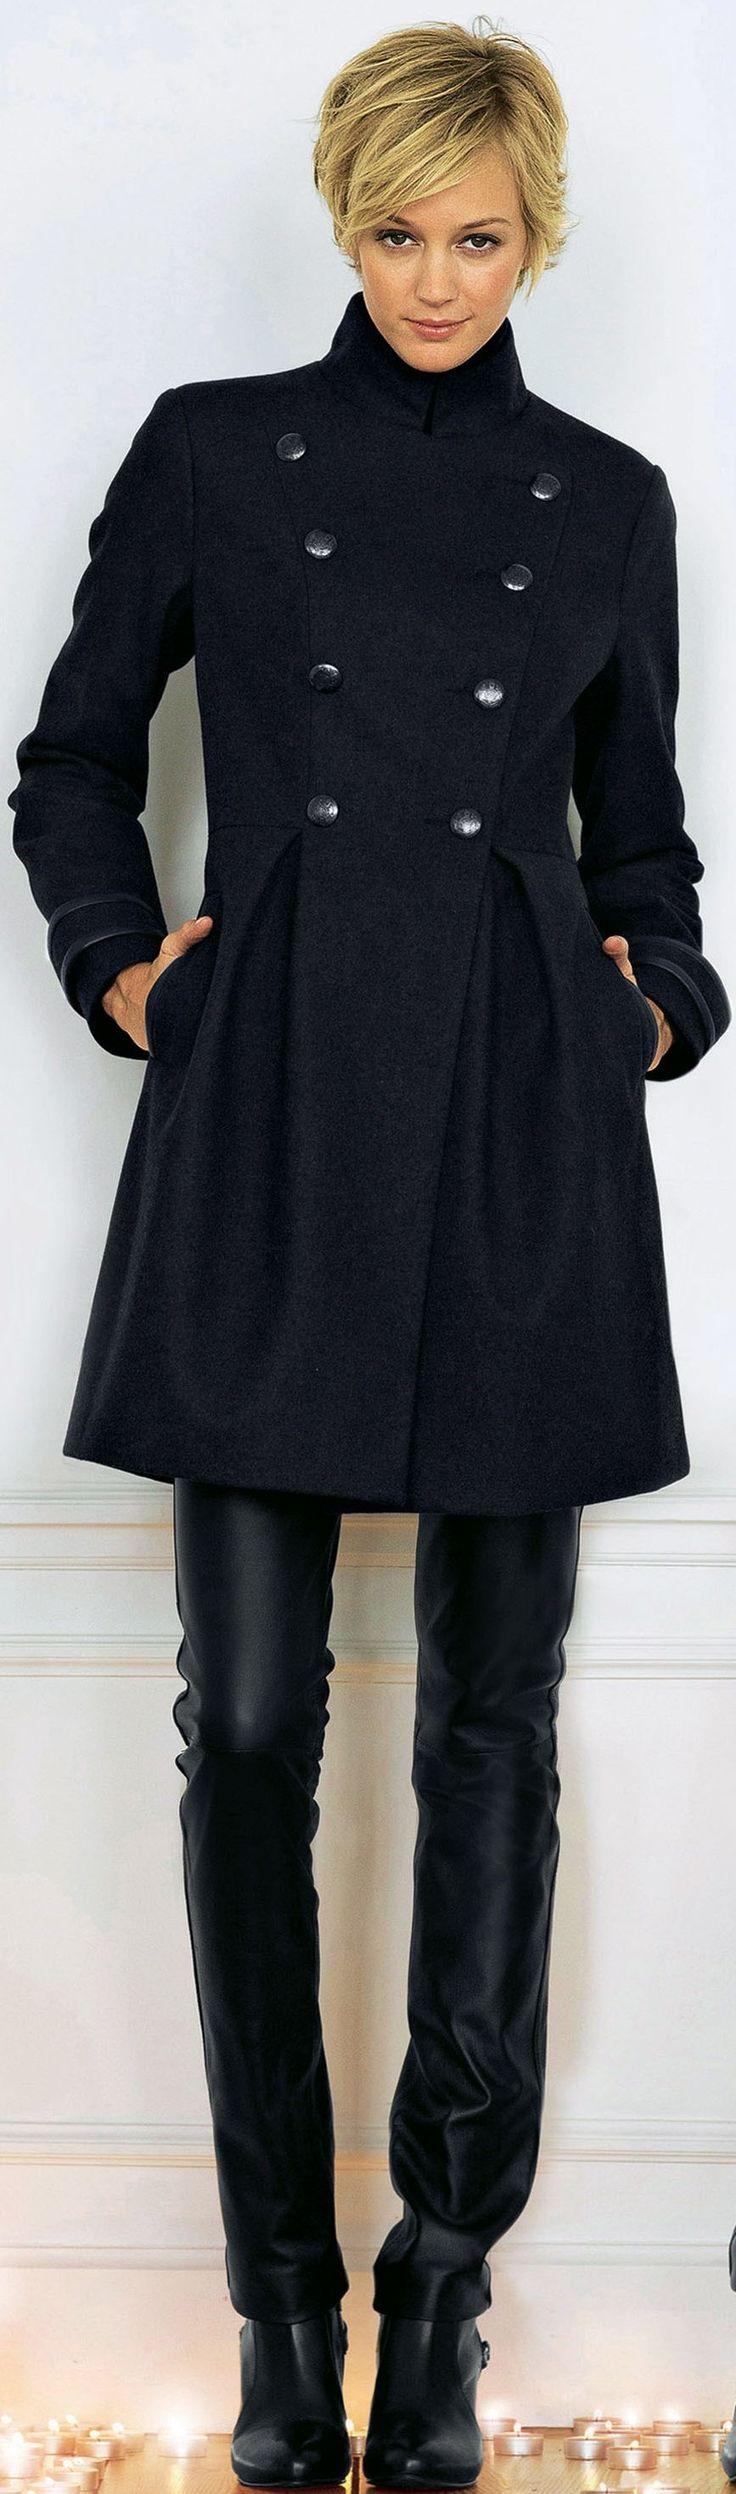 Minimalist Wardrobe For Women Over 50 -   Minimalist Wardrobe for Women Over 50